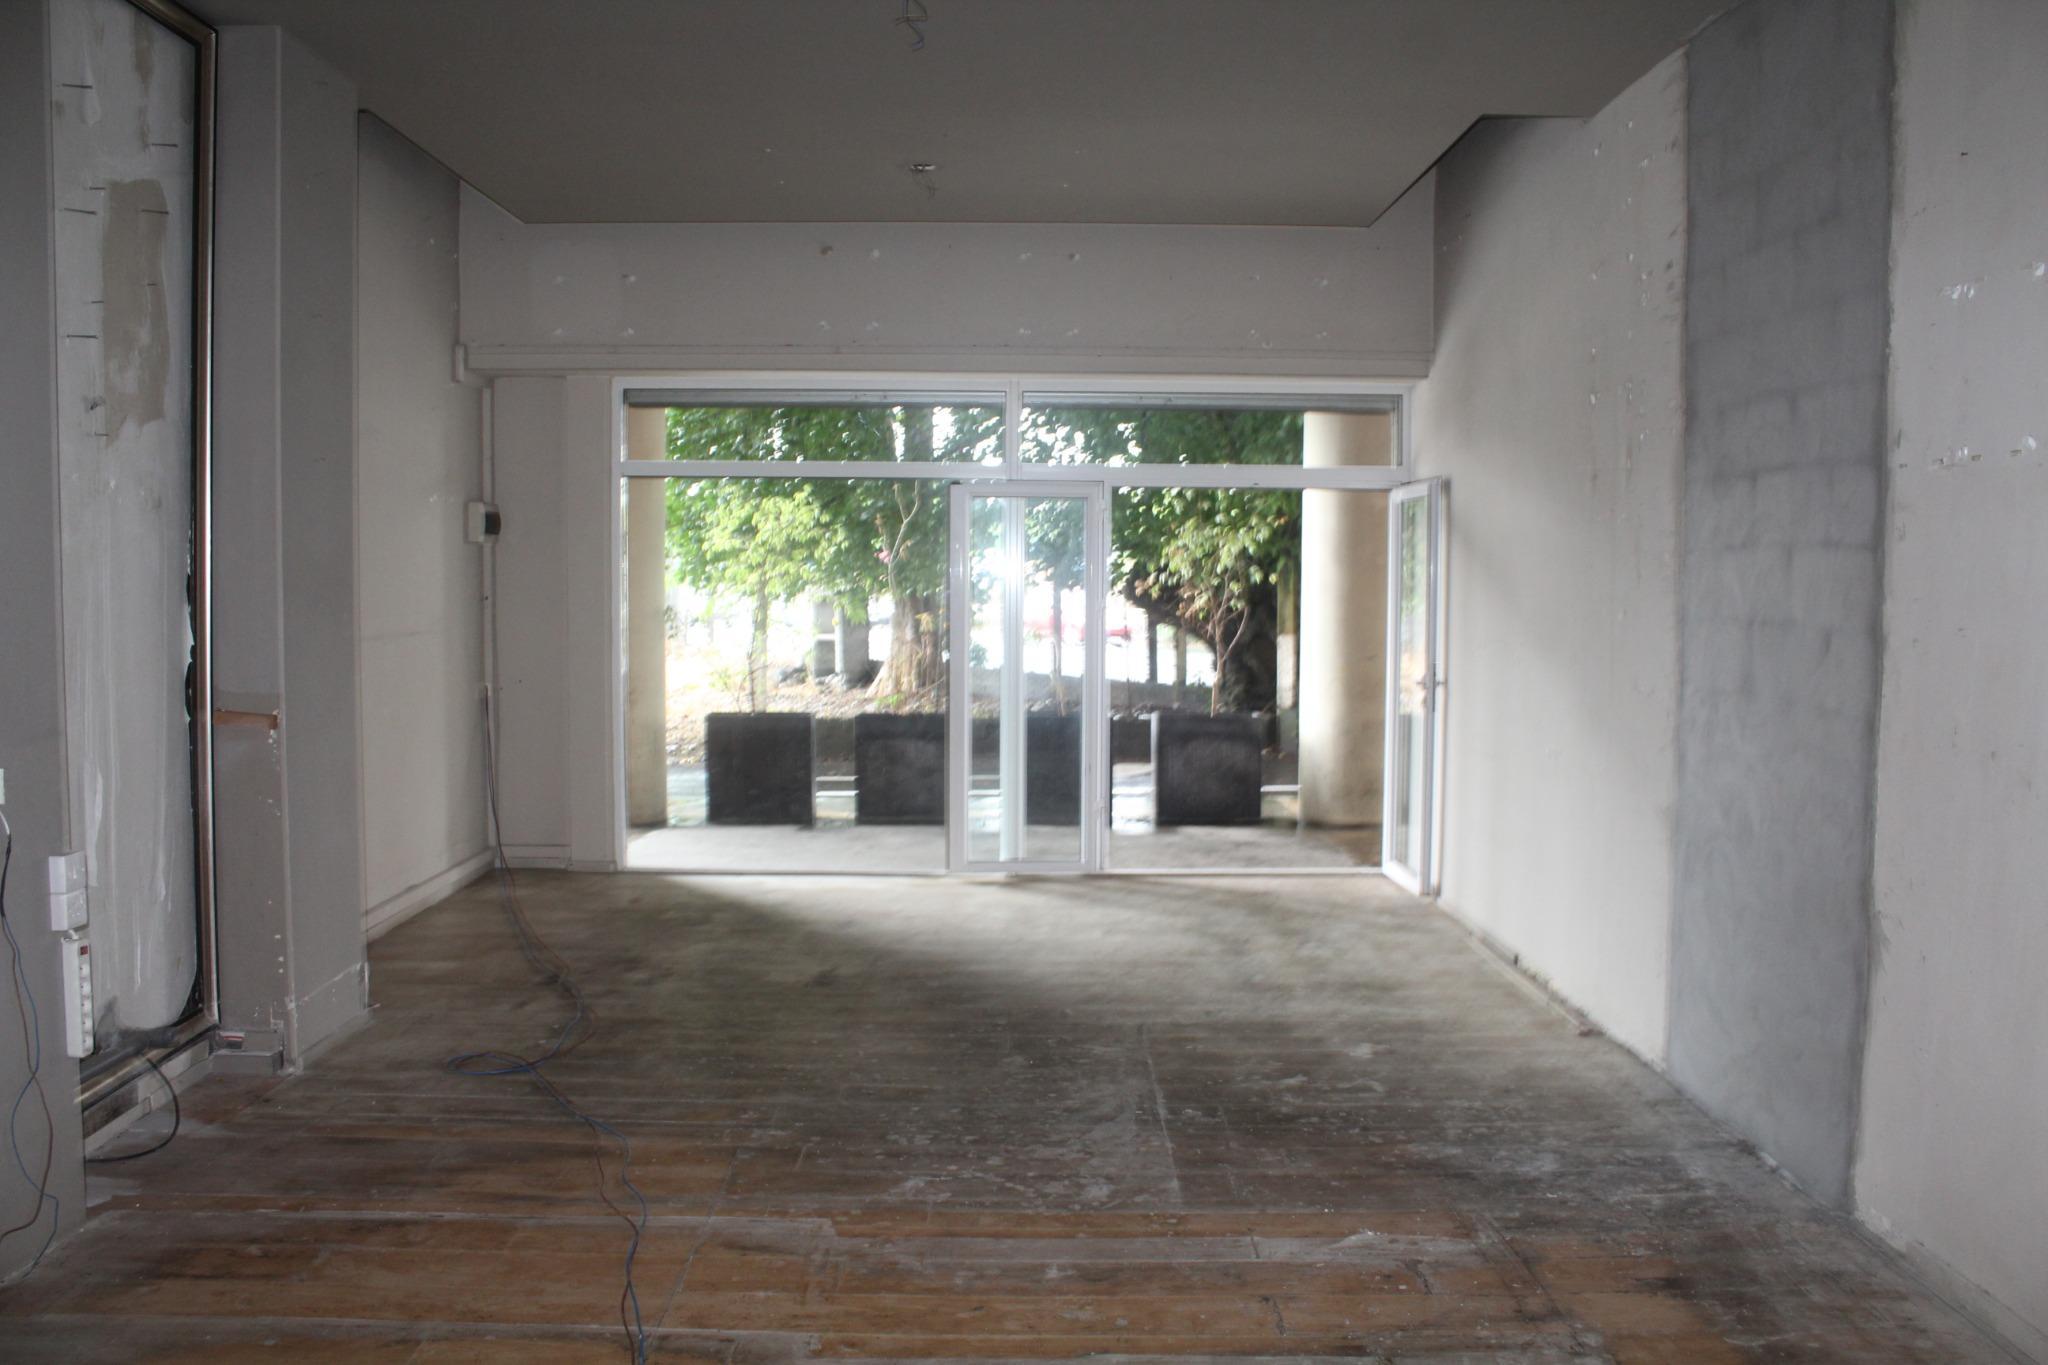 A VENDRE – Local commercial de 208 m2 à Quatre Bornes